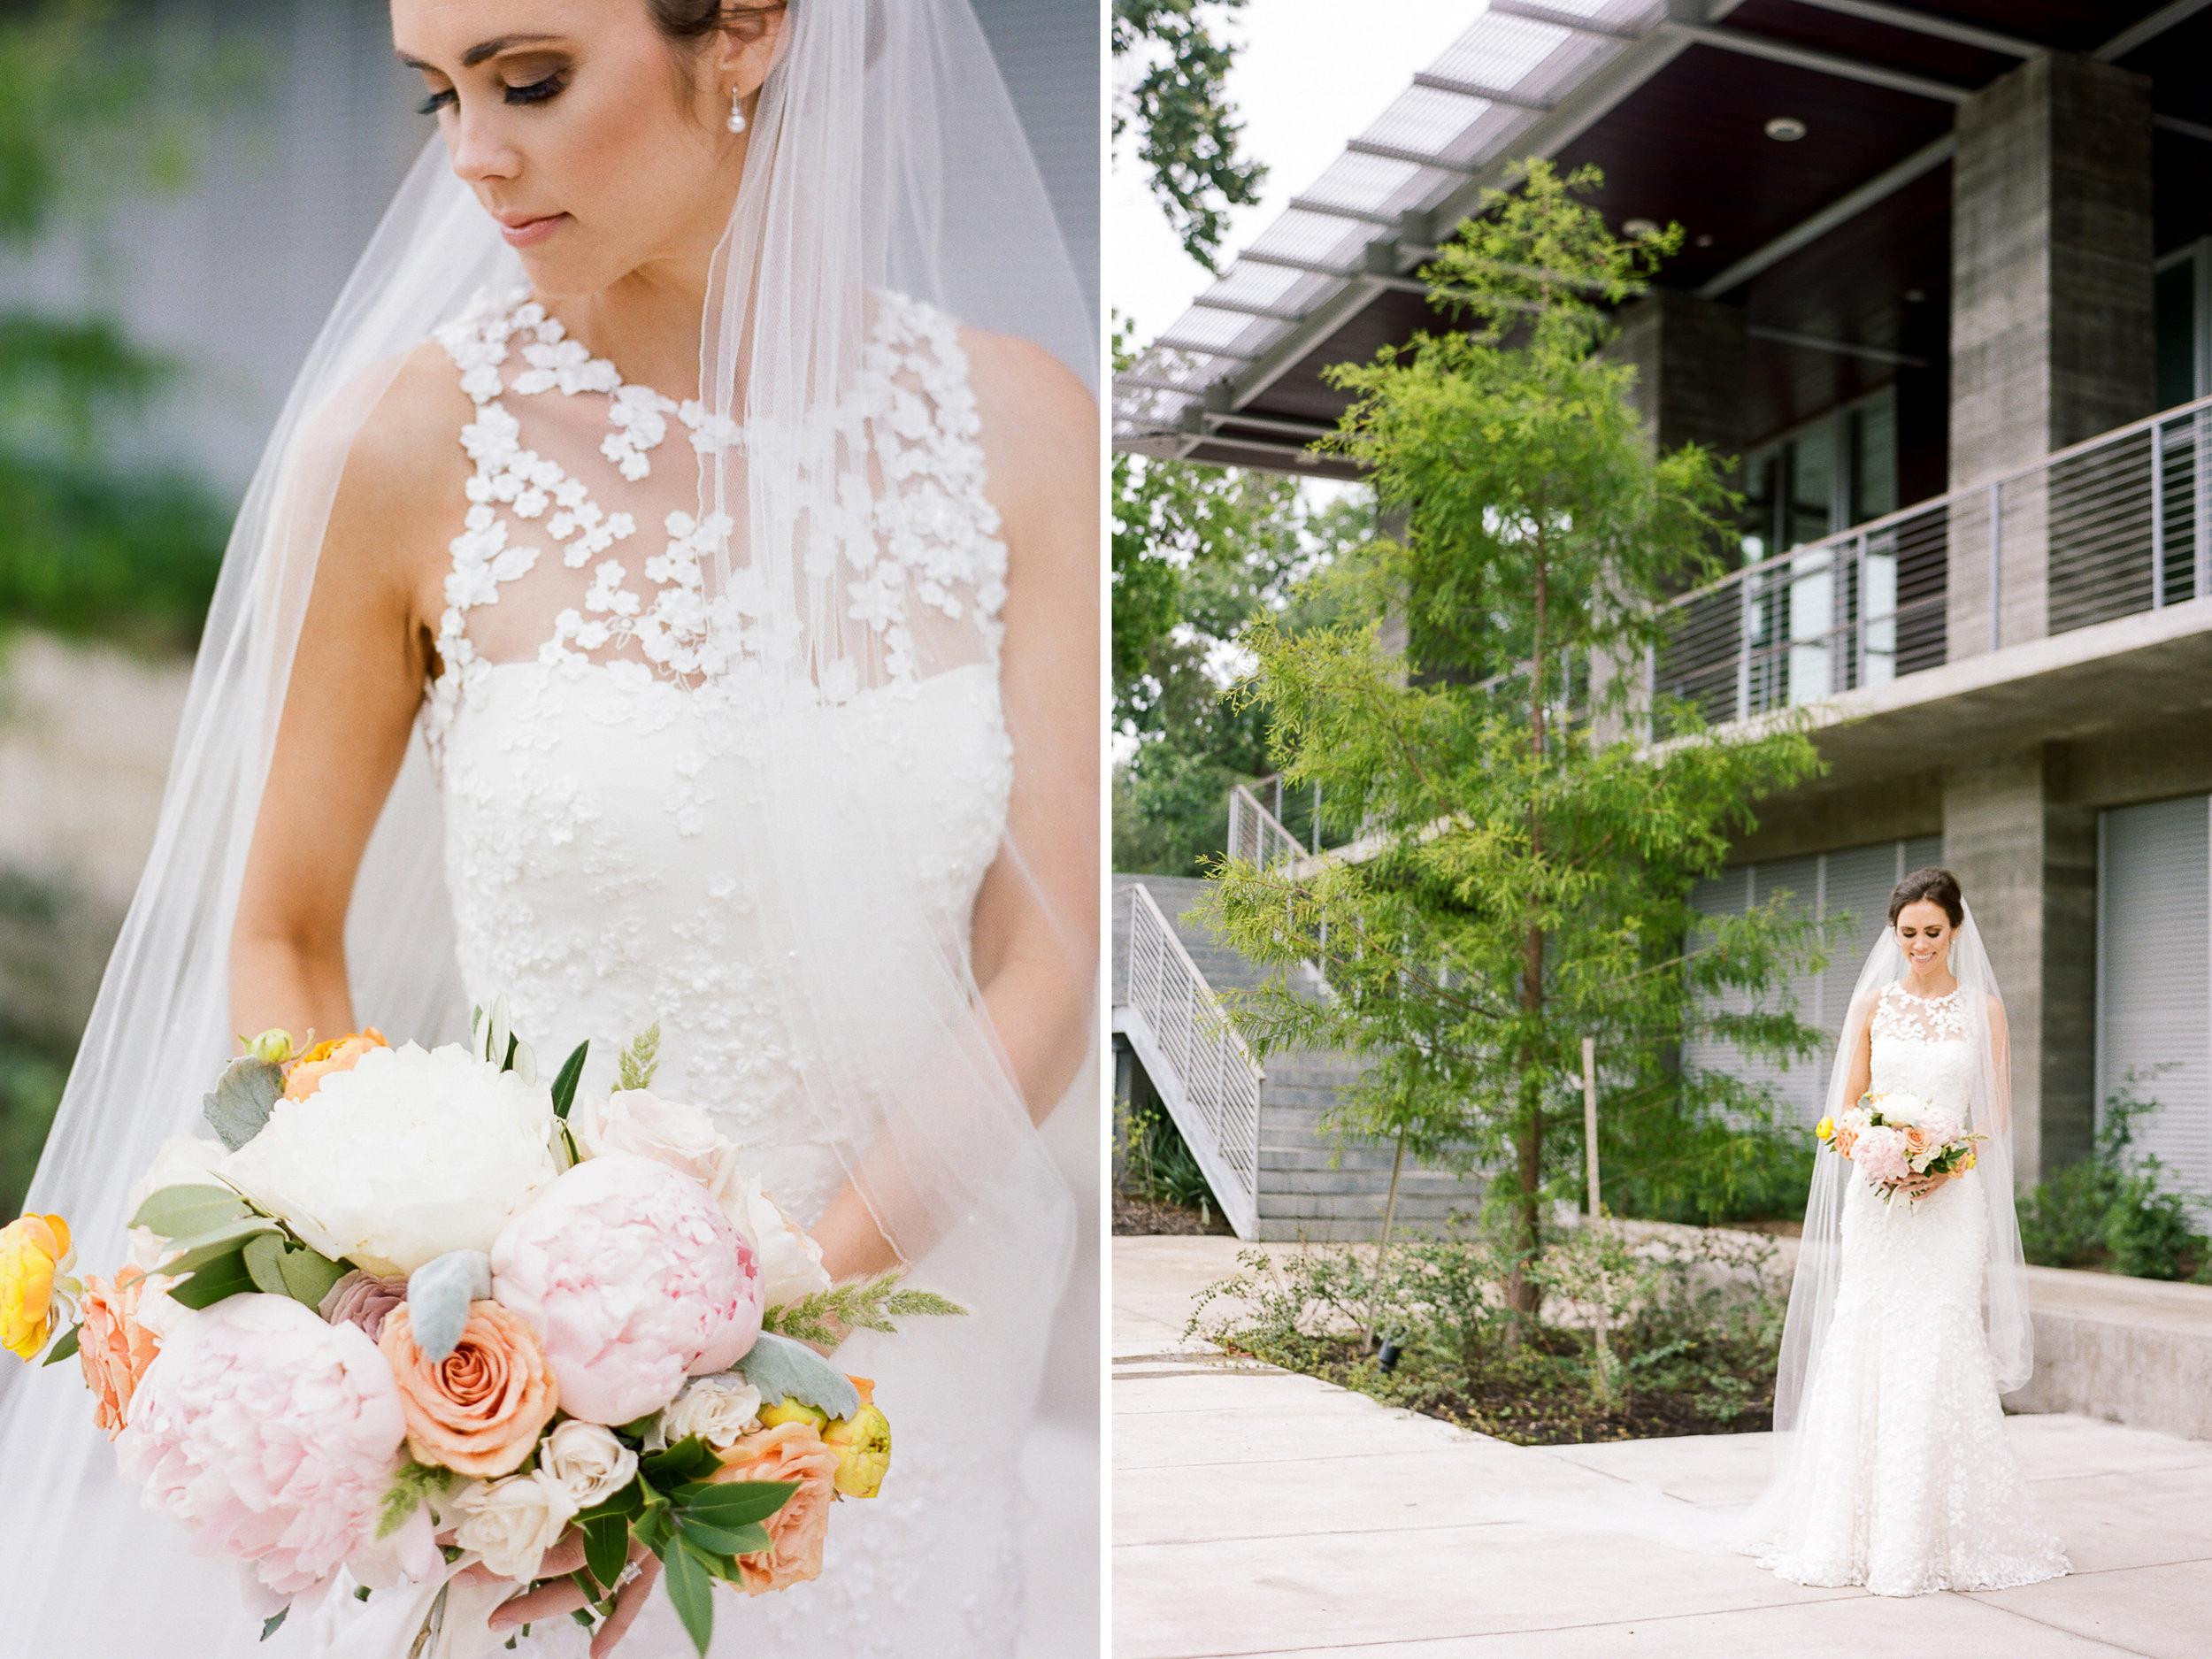 The-Dunlavy-Wedding-Photography-Bridals-Houston-Film-Dana-Fernandez-Photography-Potraits-105.jpg